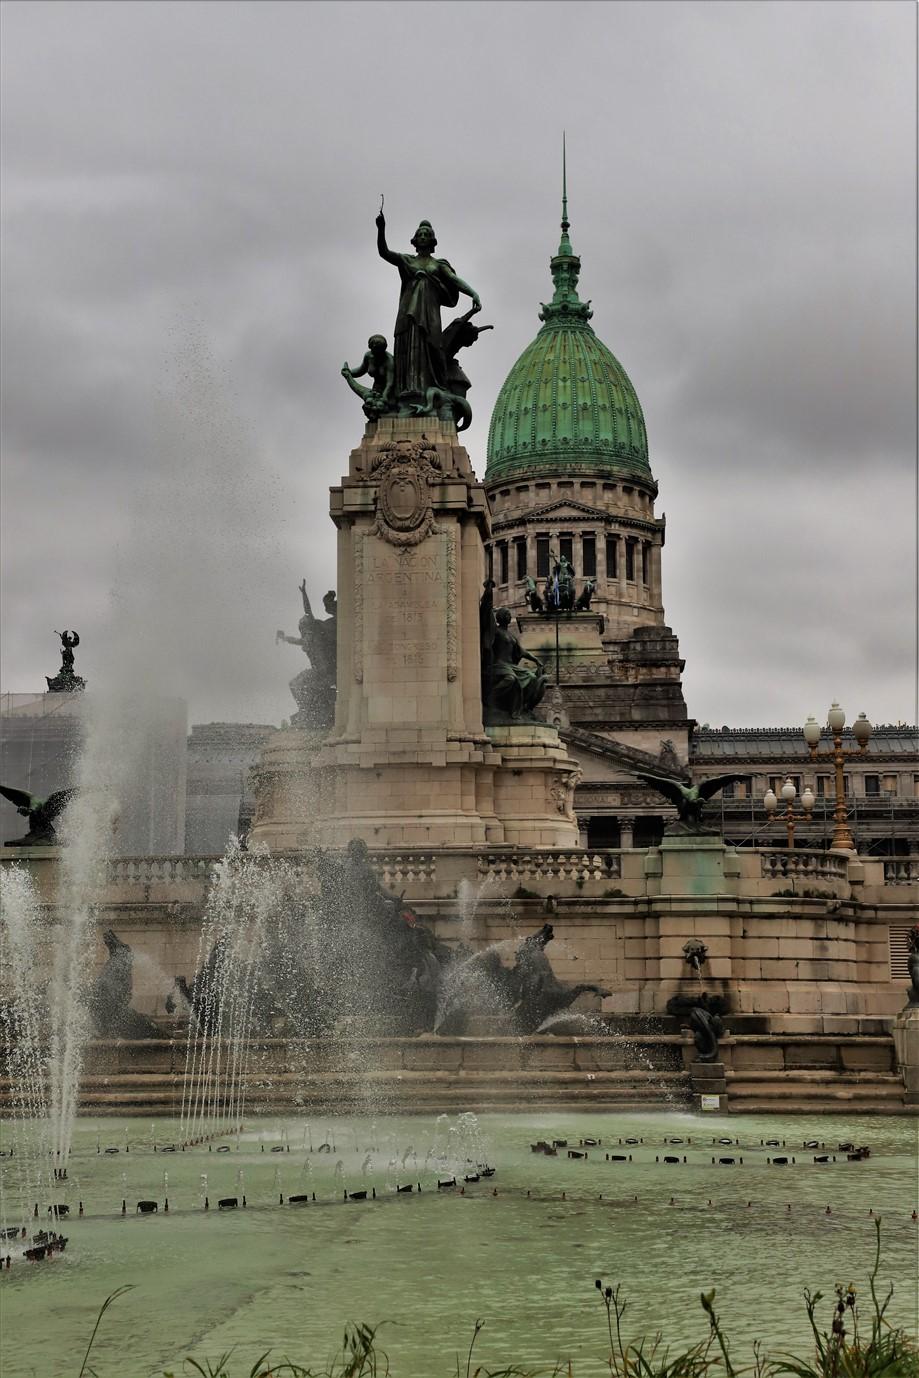 Buenos Aires – June 2019 – A Walk Down the Avenida deMayo